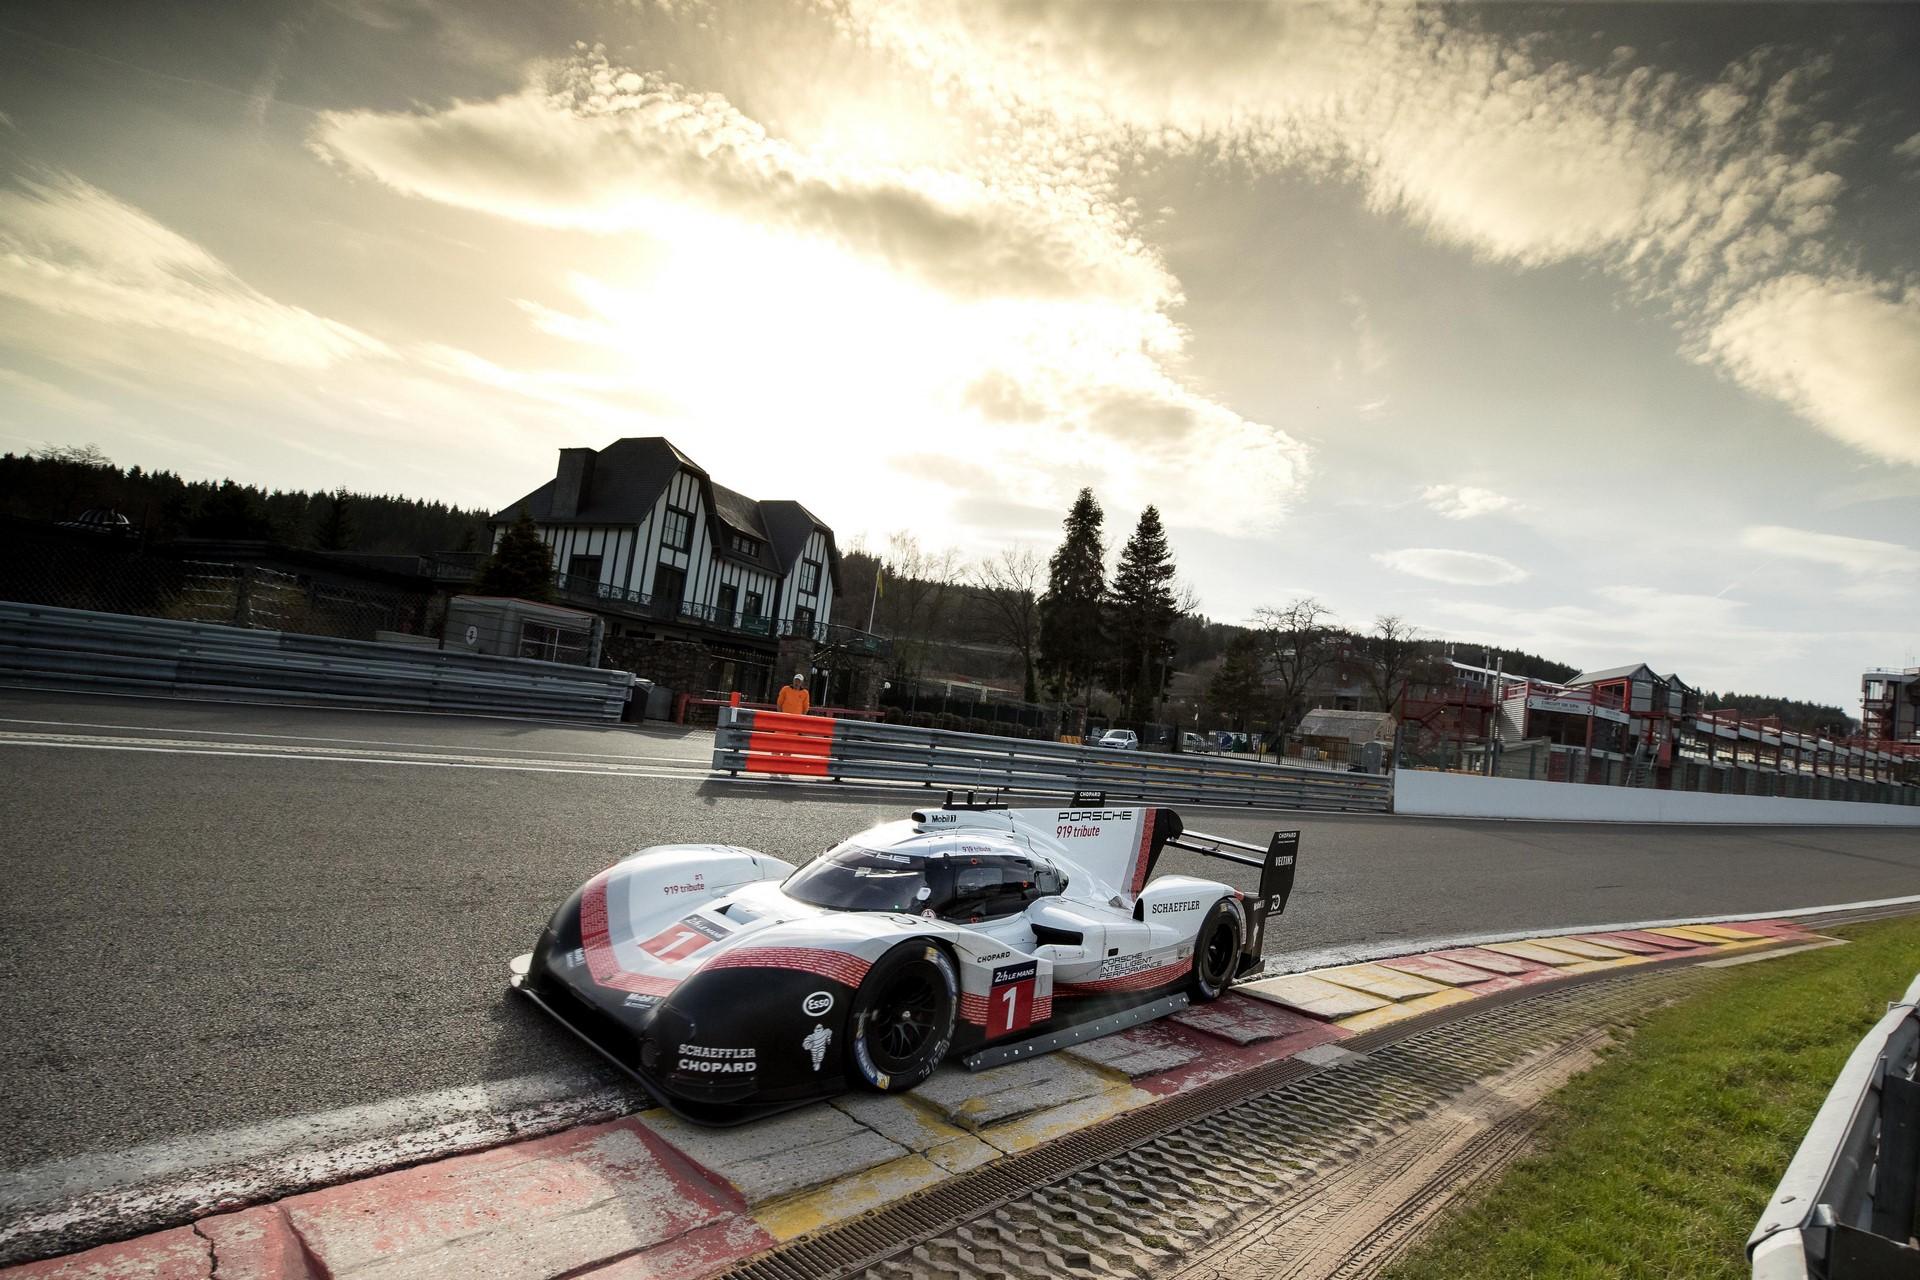 Porsche 919 Hybrid Evo Spa Record (38)